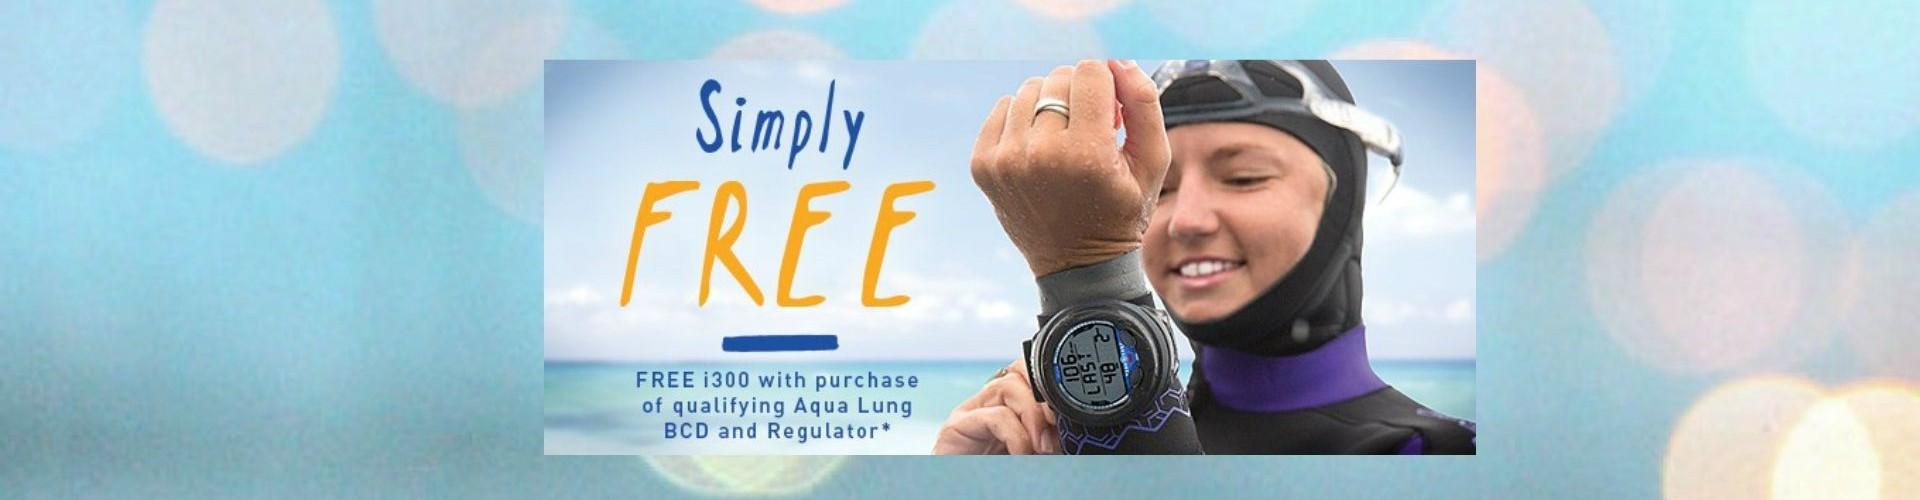 Free Aqualung i300